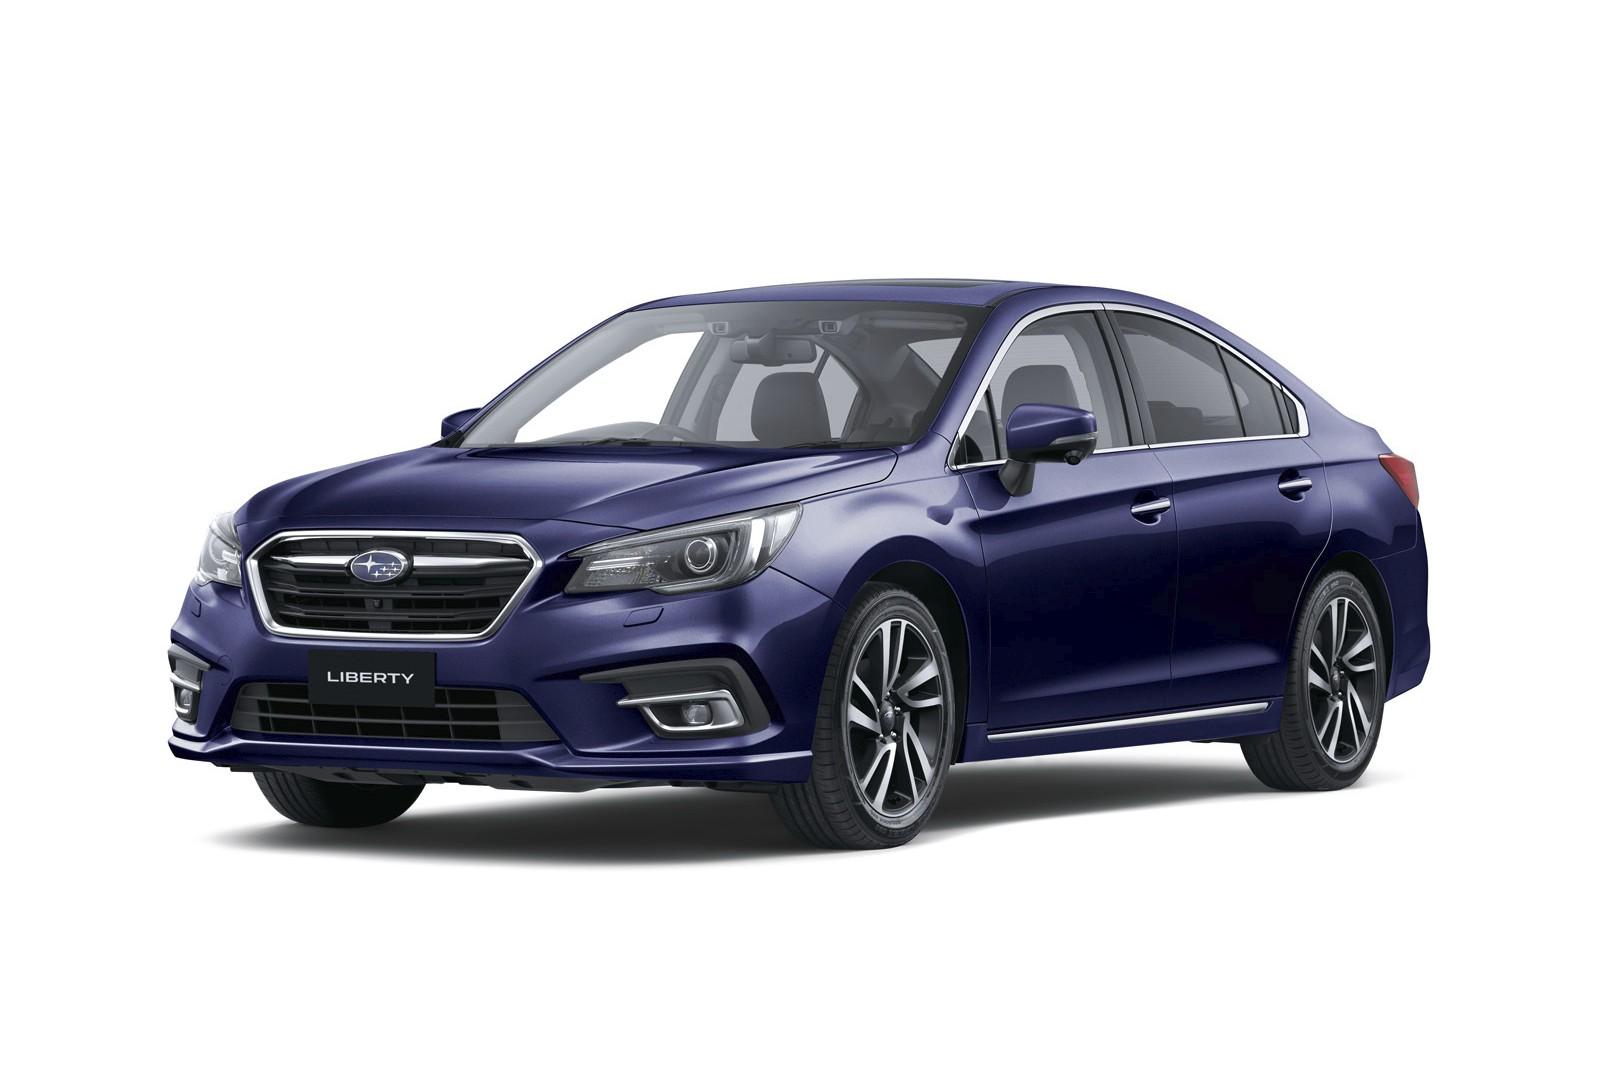 2020 Subaru Liberty 3.6R AWD MY20 / Automatic (CVT) / Sedan / 3.6L / 6 Cylinder / Petrol / 4x4 / 4 door / Model Year '20 12